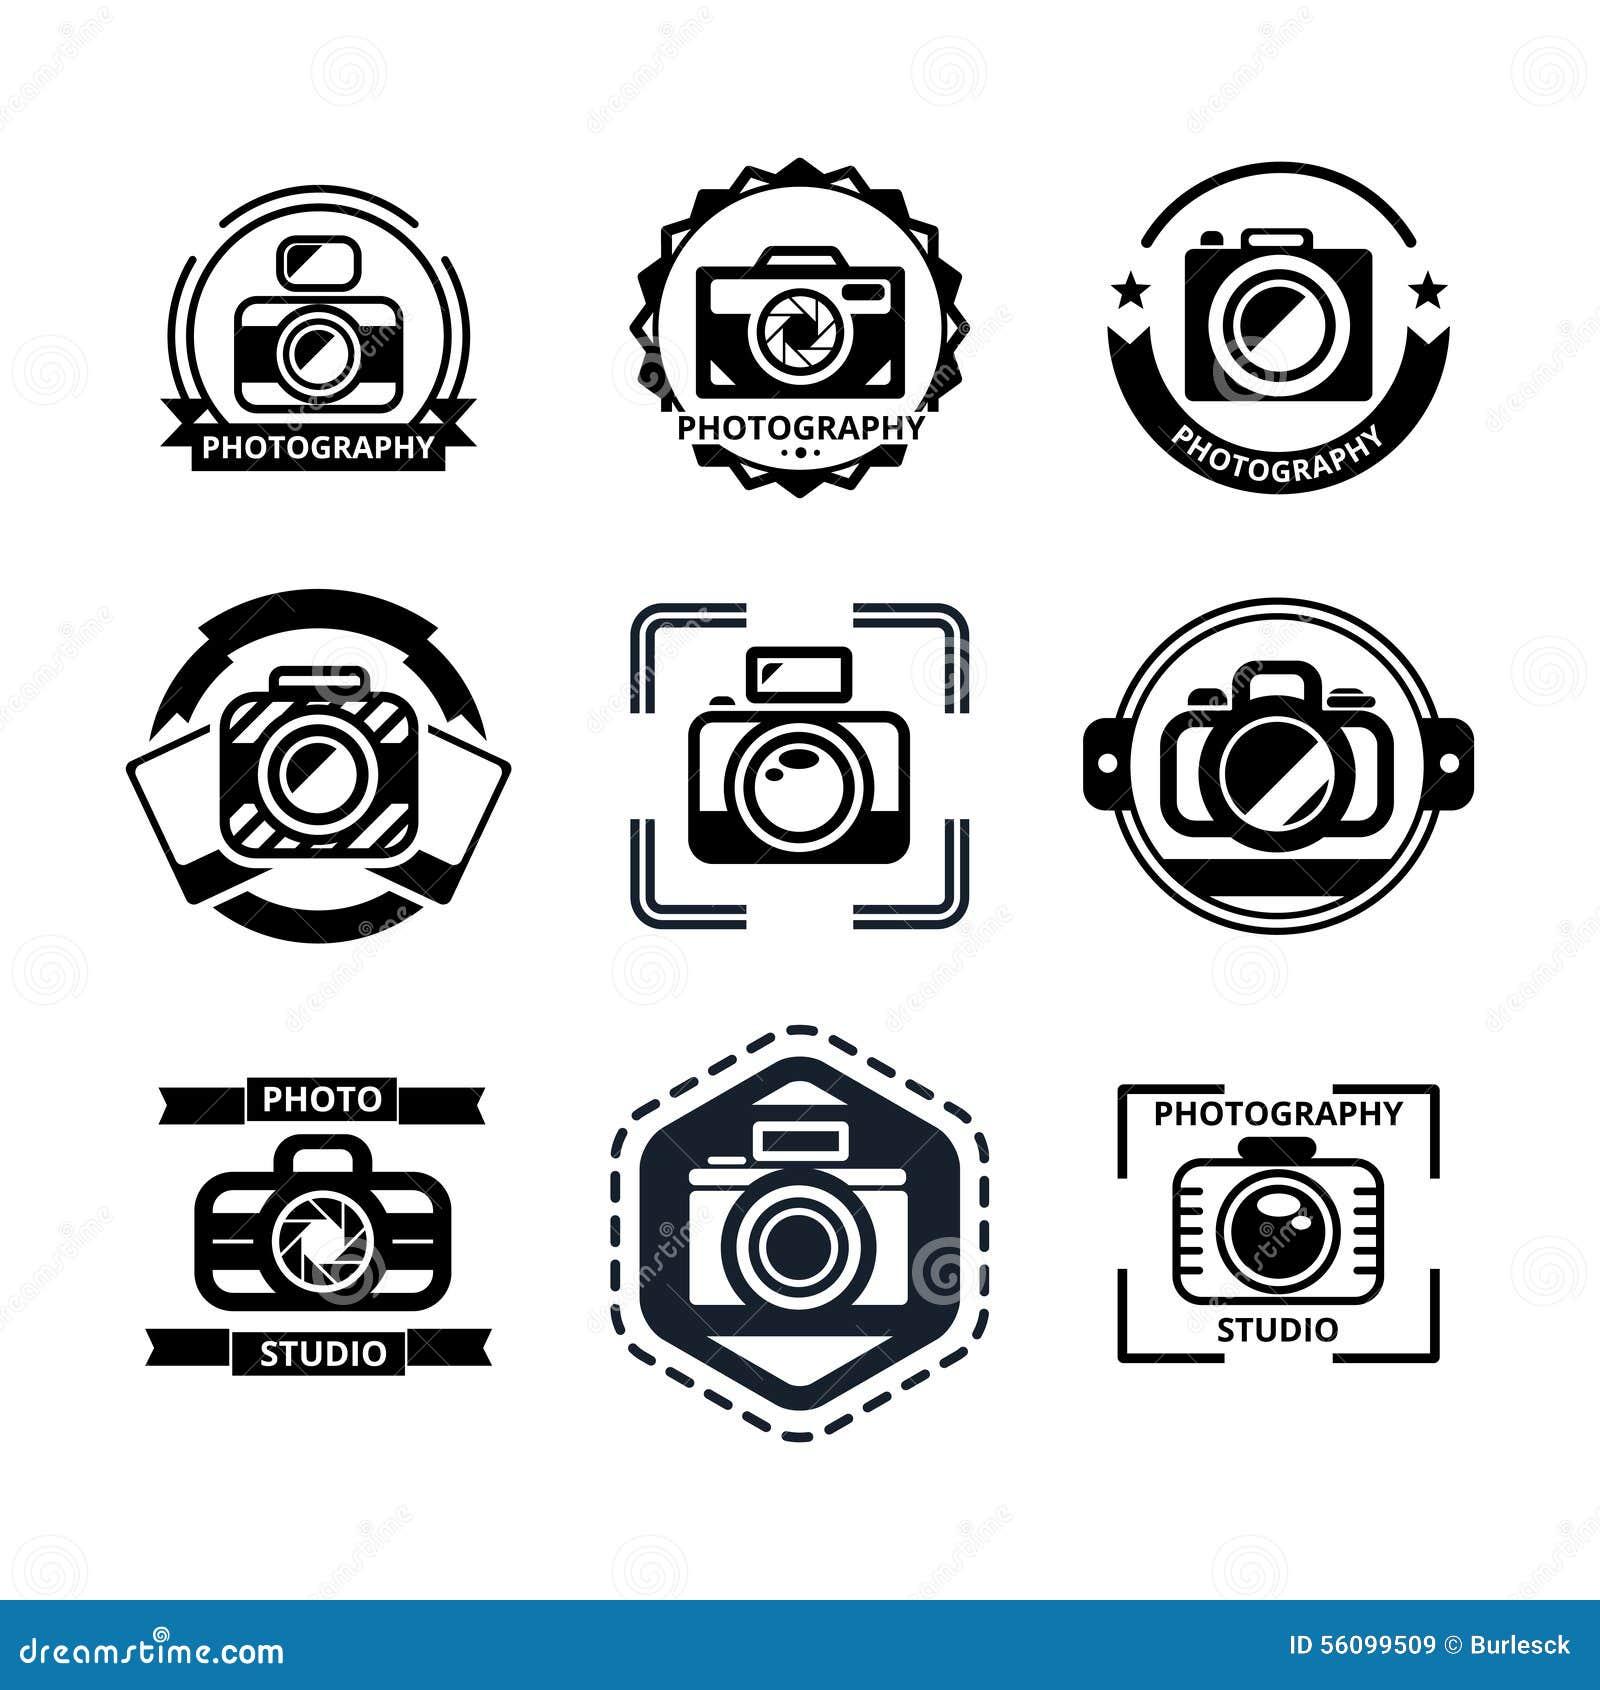 Hipster Design Studio Logo Vector: Vintage Photography Badges Or Logos Stock Vector